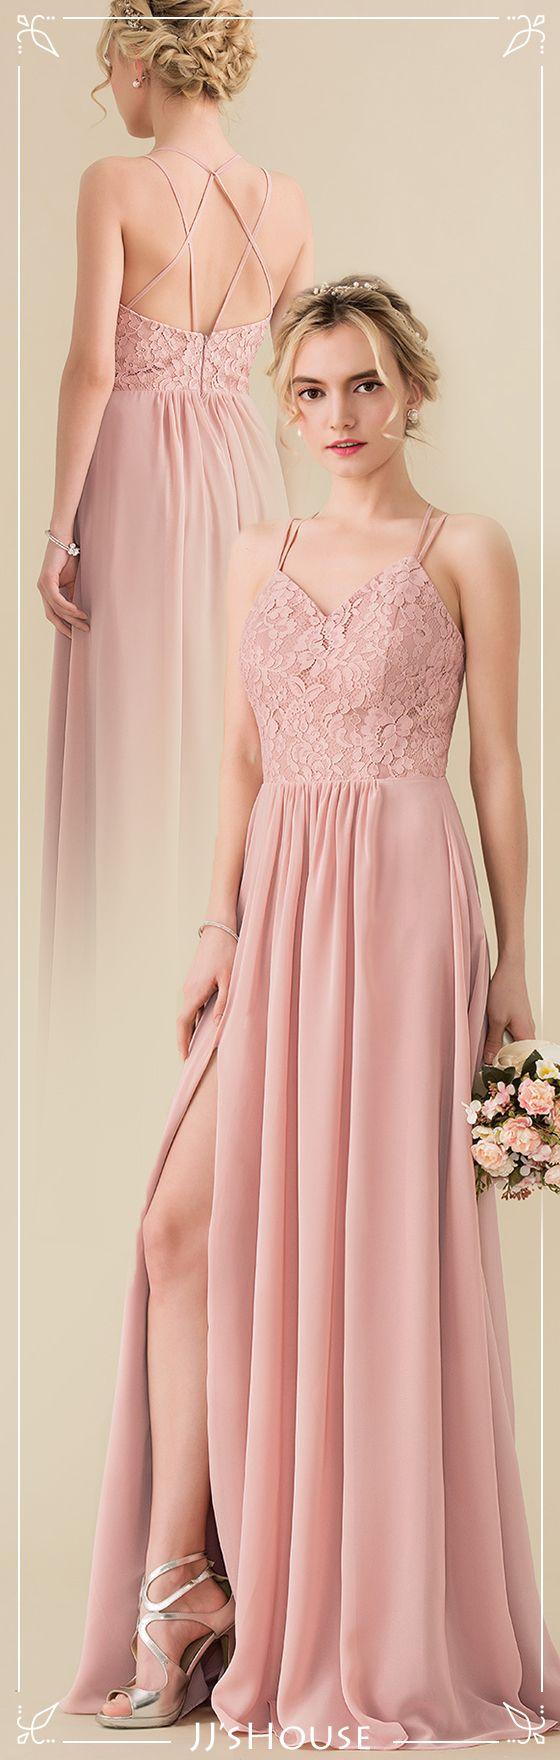 A-Line/Princess Sweetheart Floor-Length Chiffon Lace Bridesmaid ...